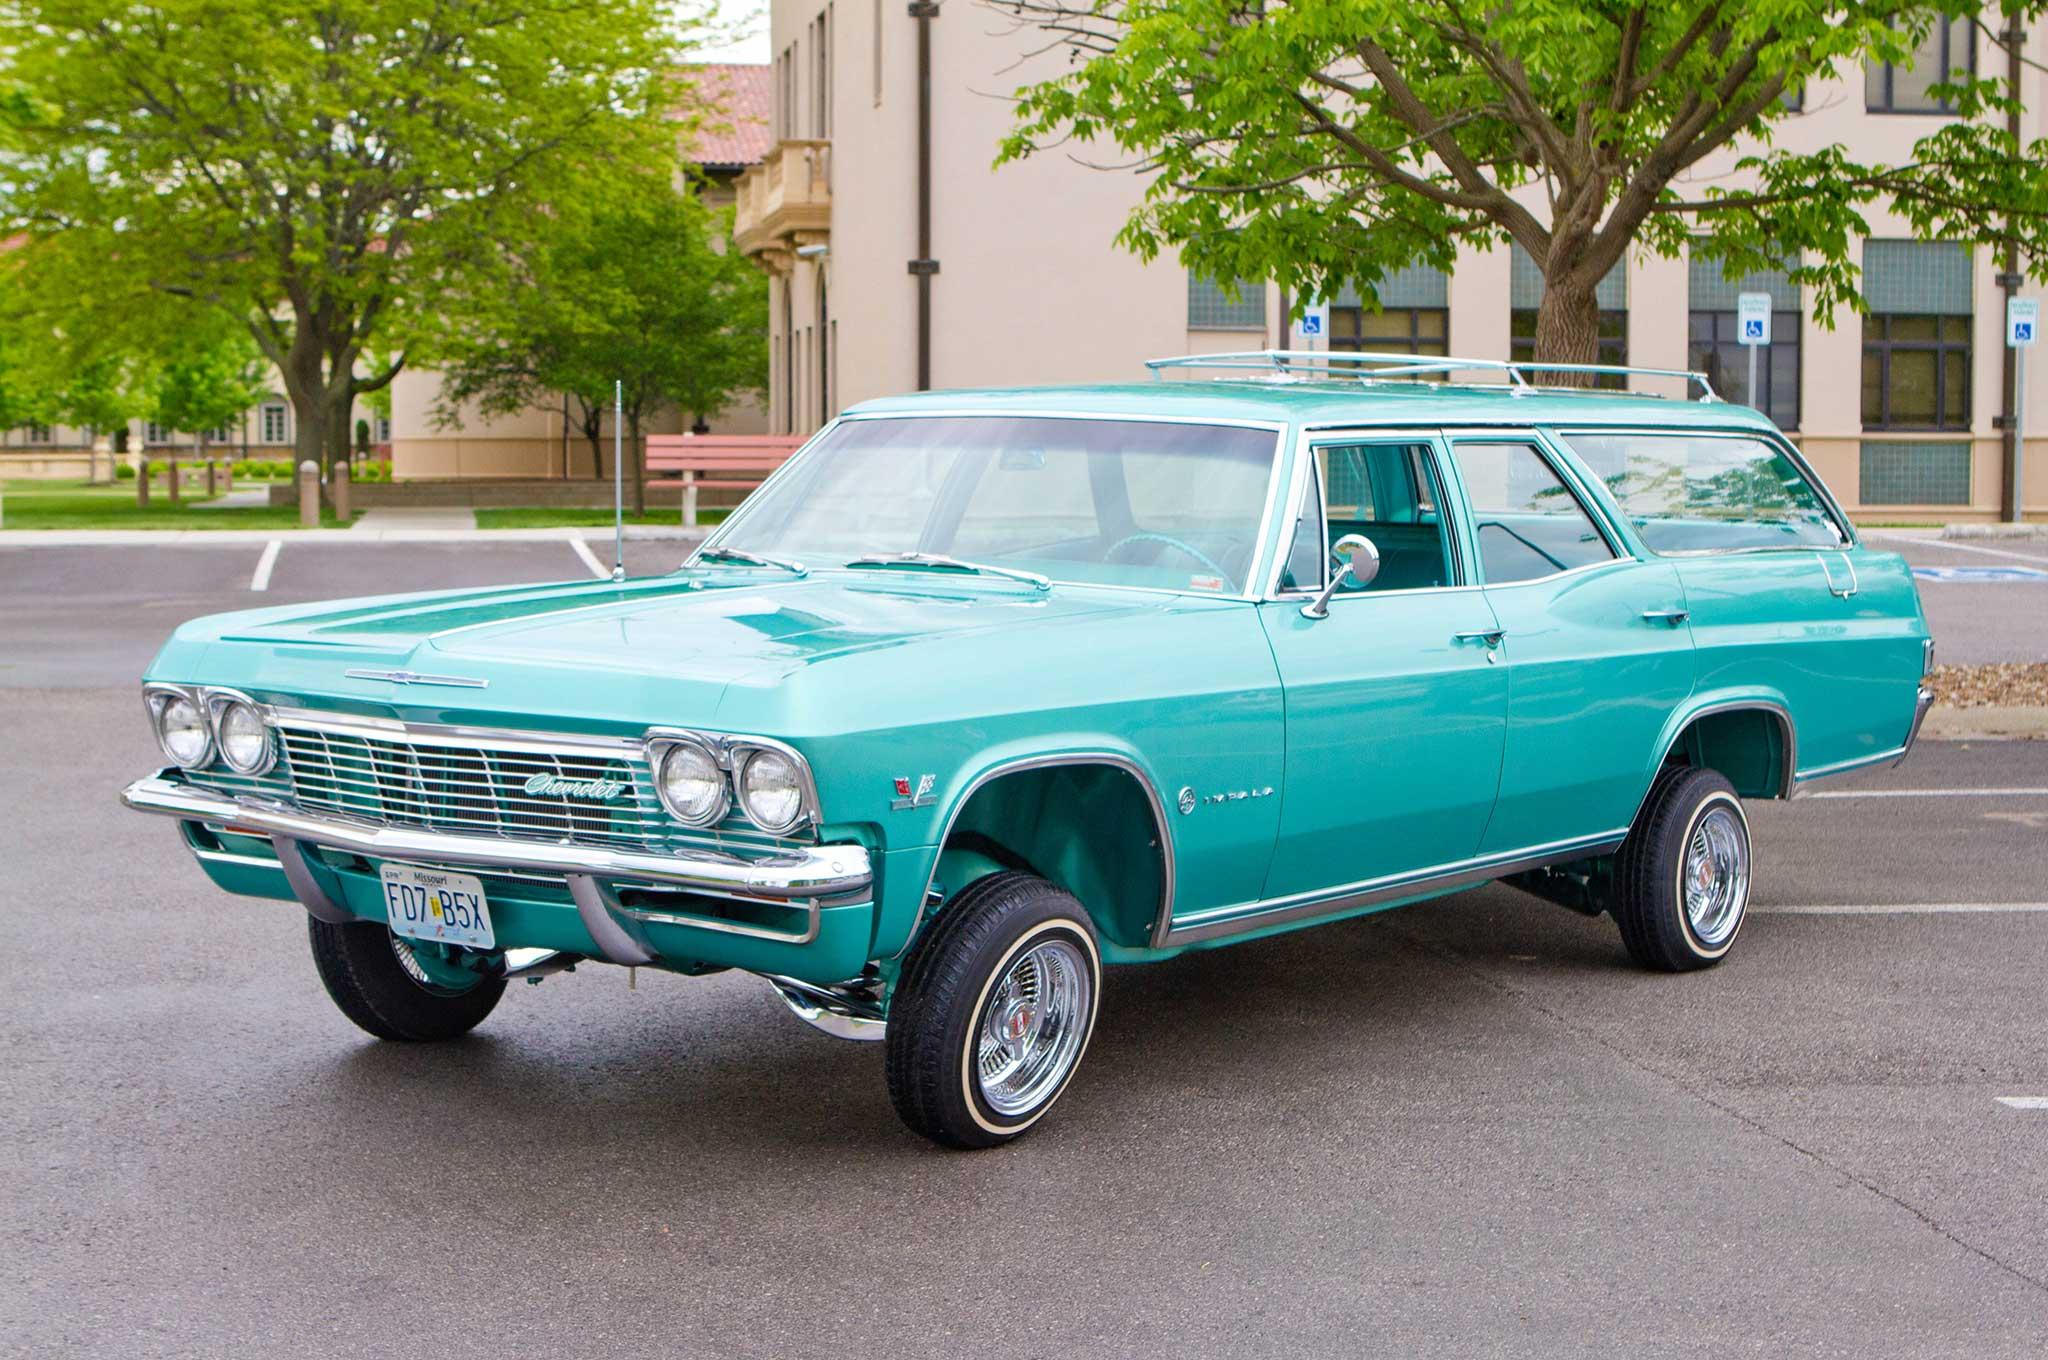 Chevrolet Impala IV 1964 - 1970 Station wagon 5 door #1